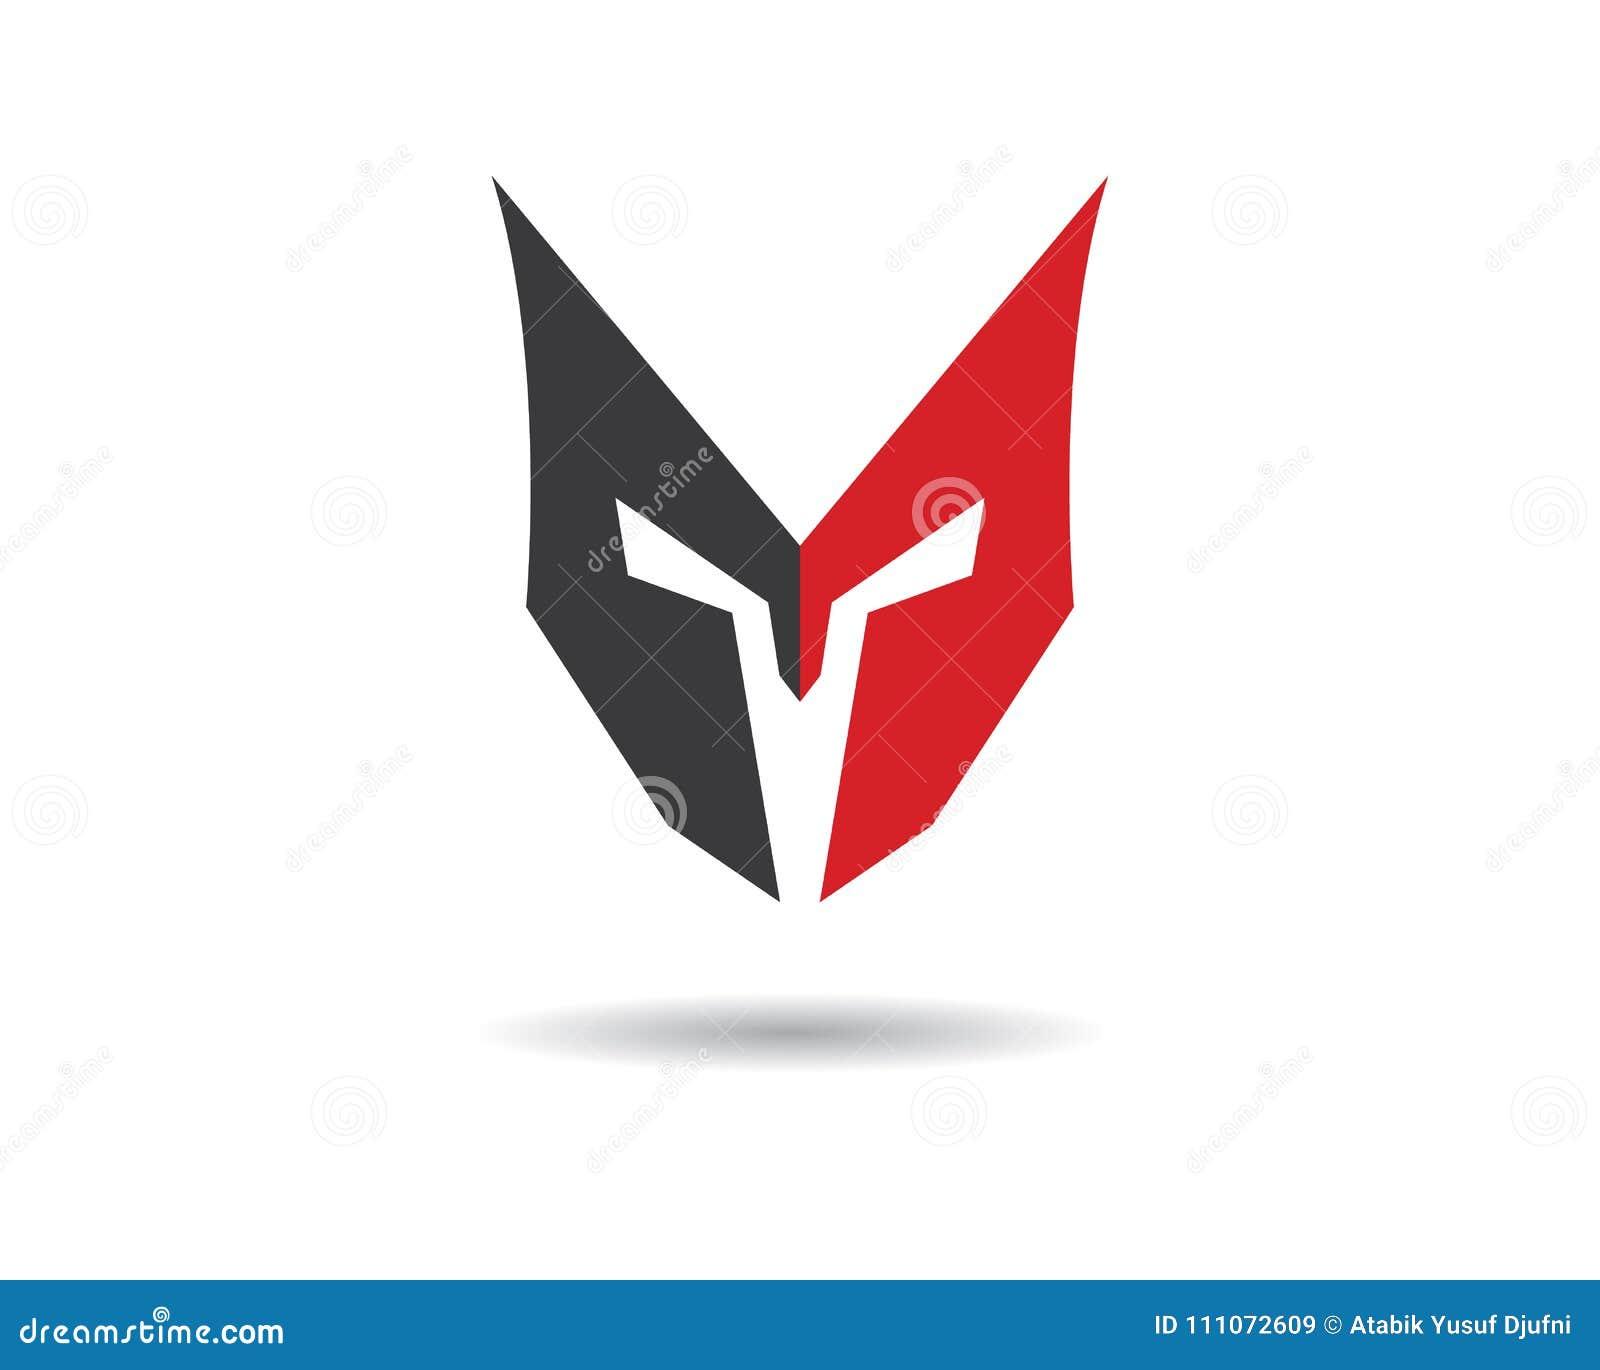 2c25713f50de1 Spartan helmet logo template vector icon. More similar stock illustrations